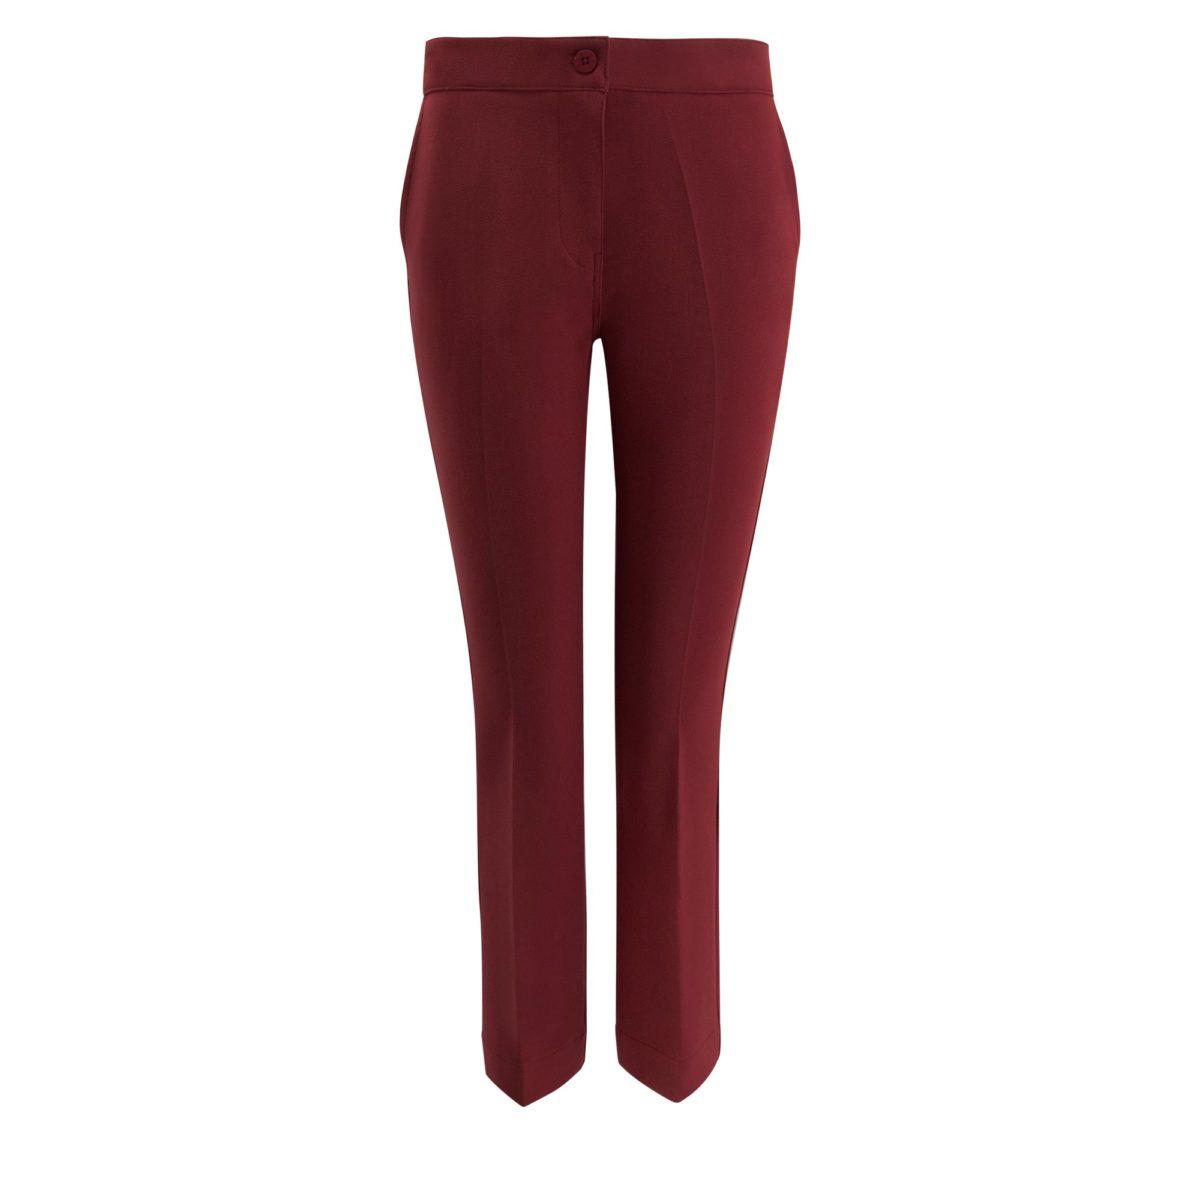 Pantalone Flare Bordeaux - vista frontale | Nicla